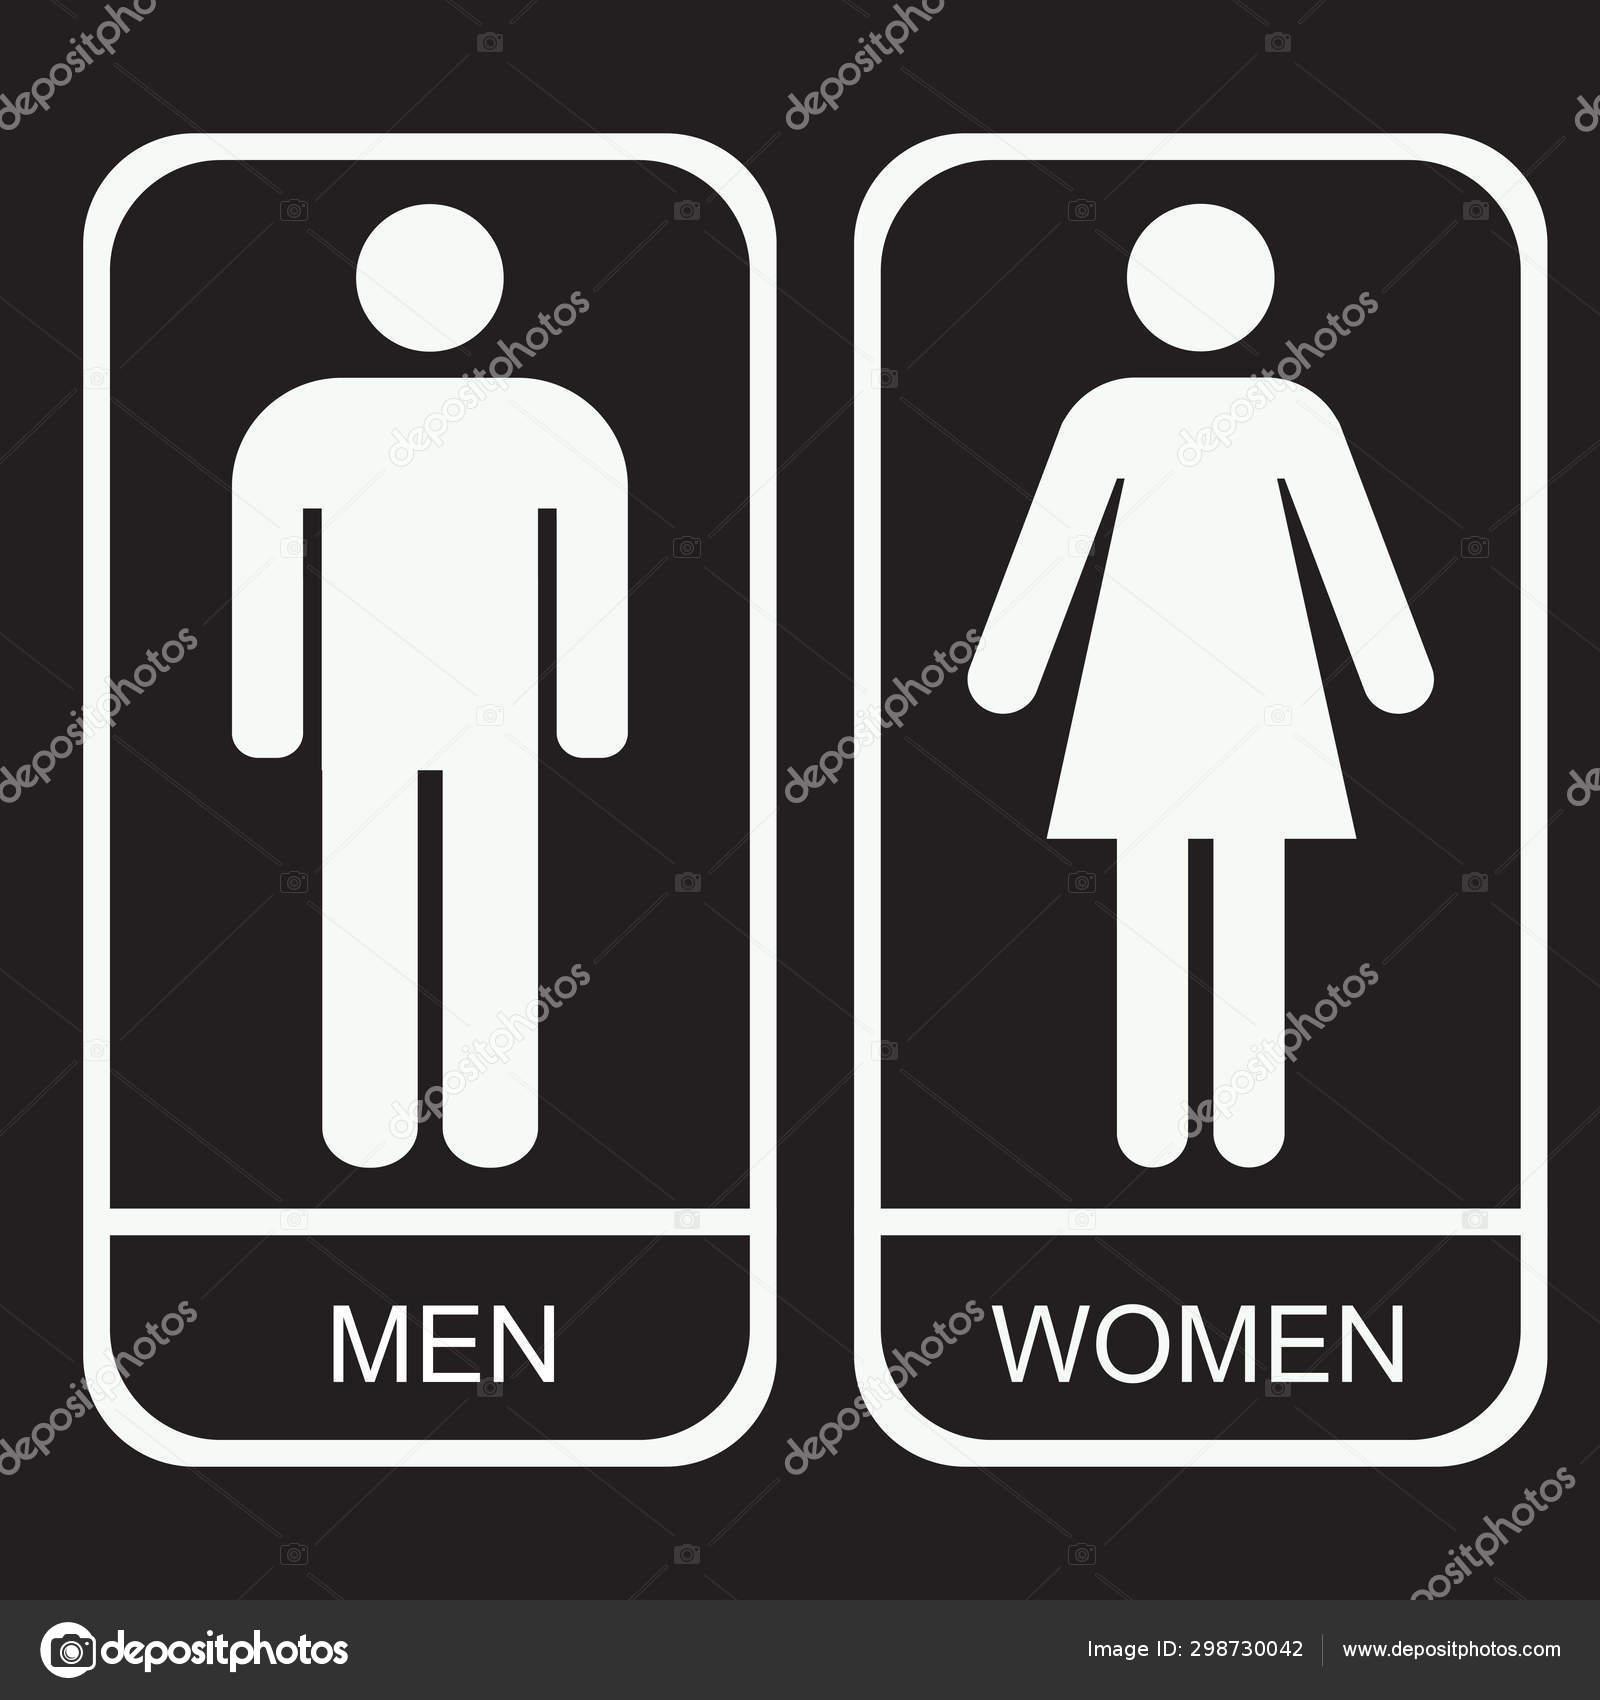 Restroom Sign Vector Icon Stock, Men And Women Bathroom Sign